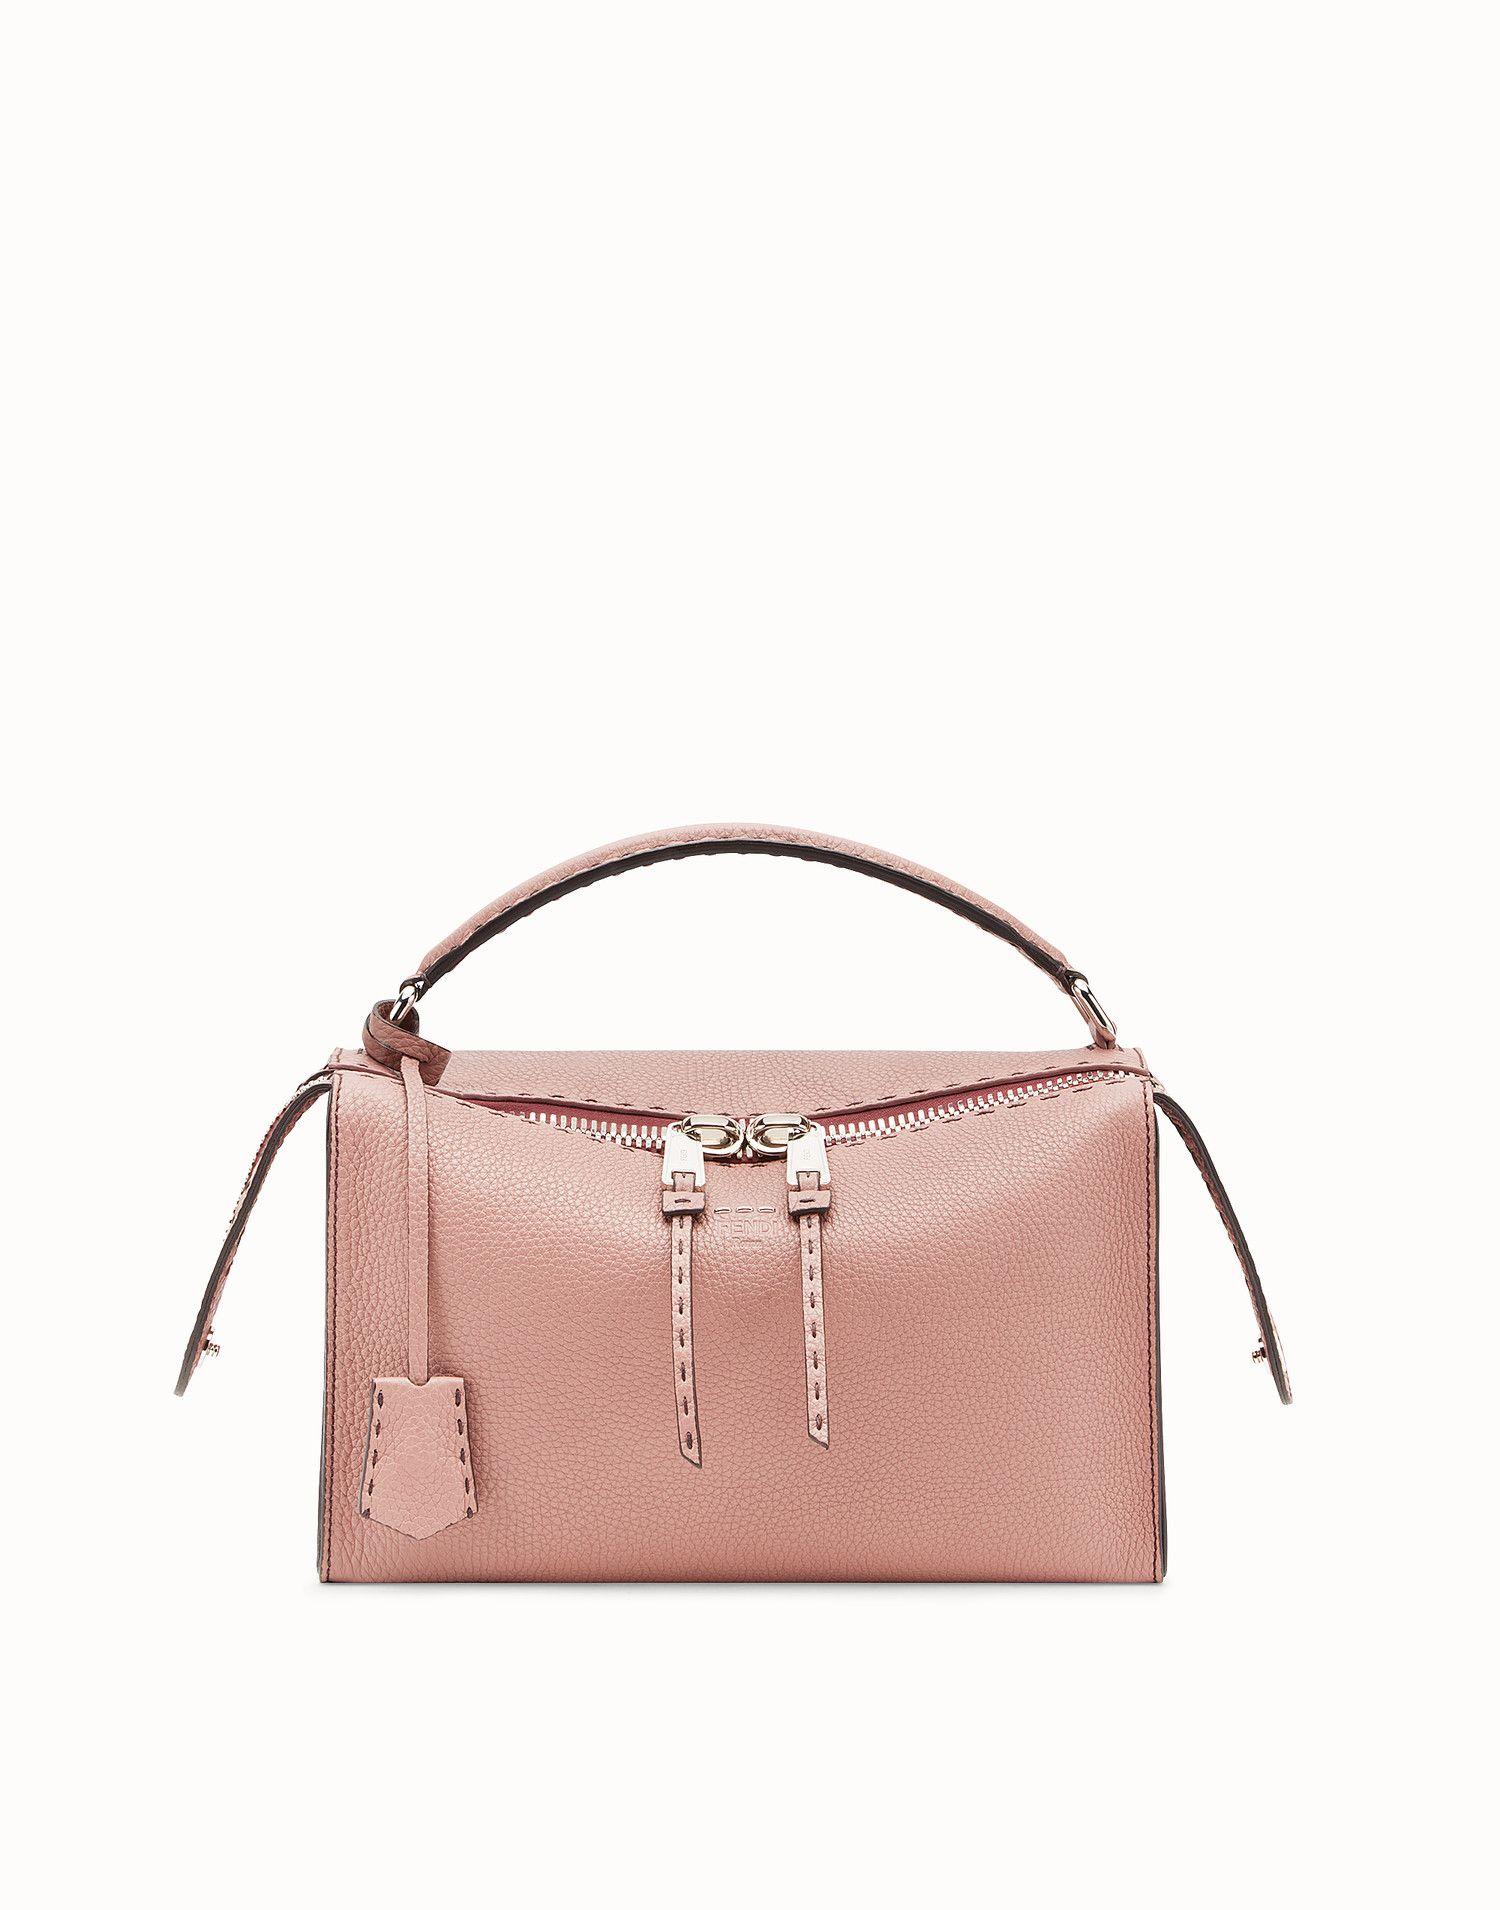 f1762949e0 FENDI LEI BAG SELLERIA - Pink leather Boston bag - view 1 zoom